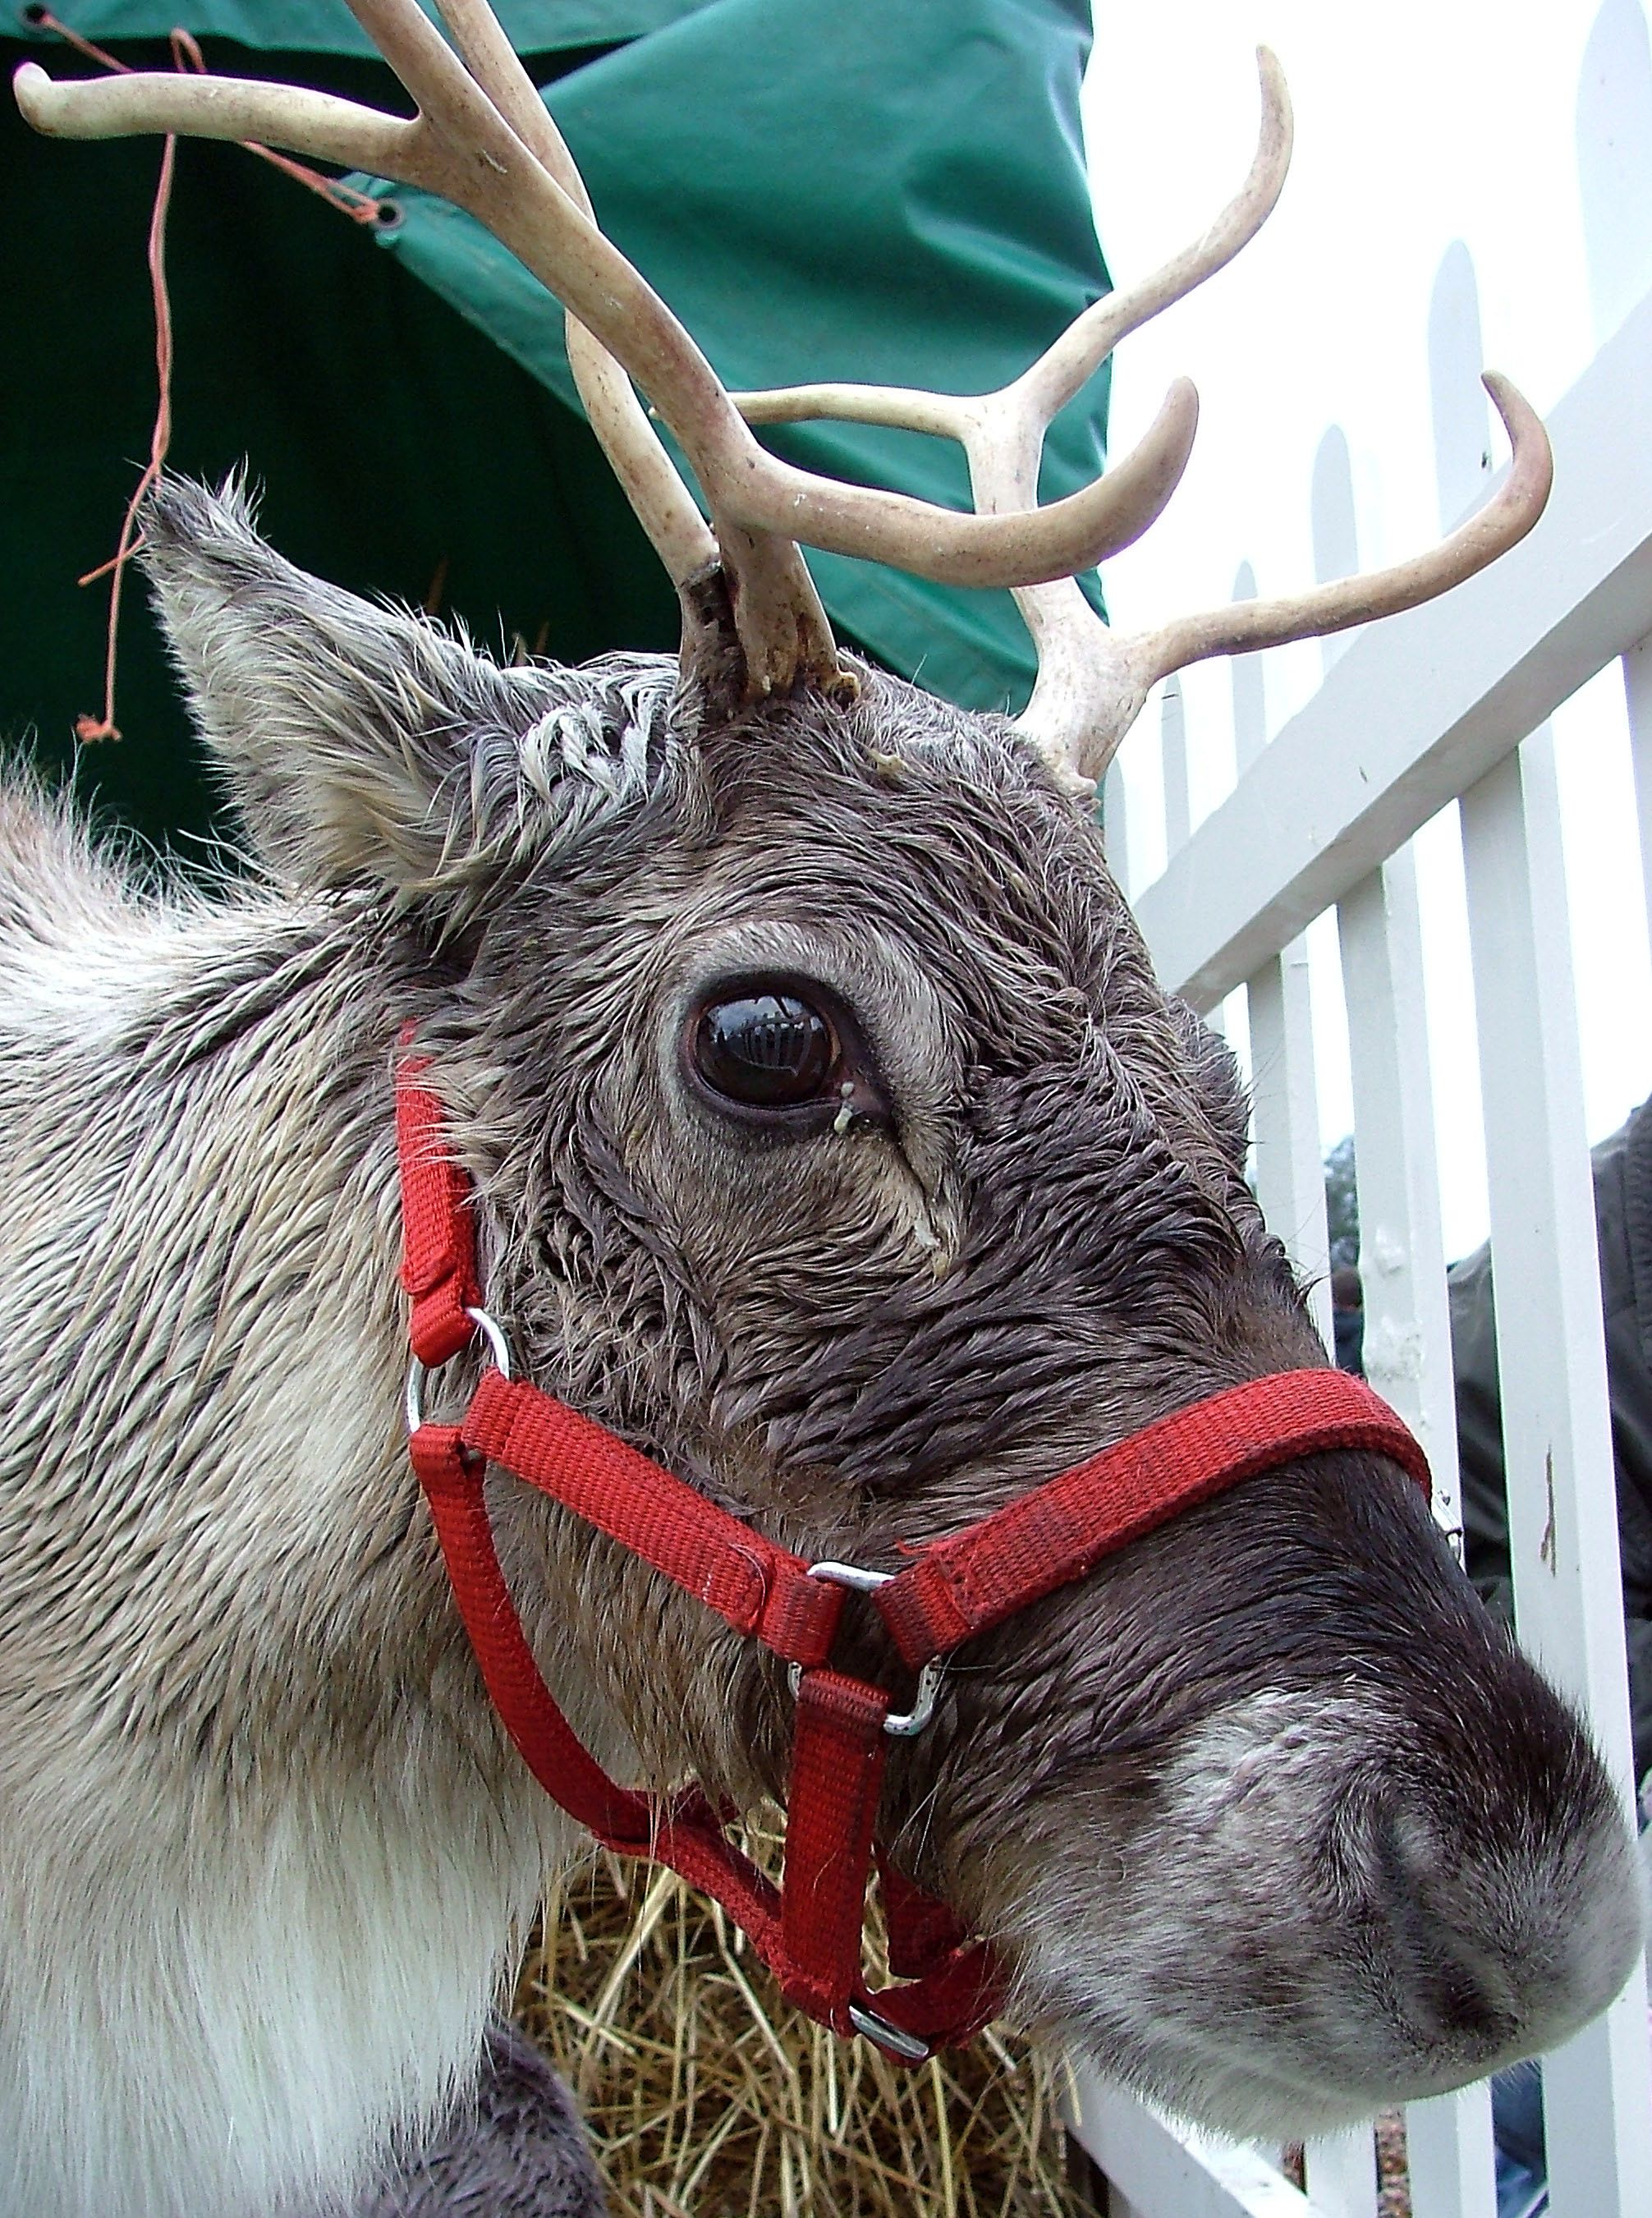 #DailyPhotoChallenge #SnapHappyBritMums #Day7 #ChristmasAnimals